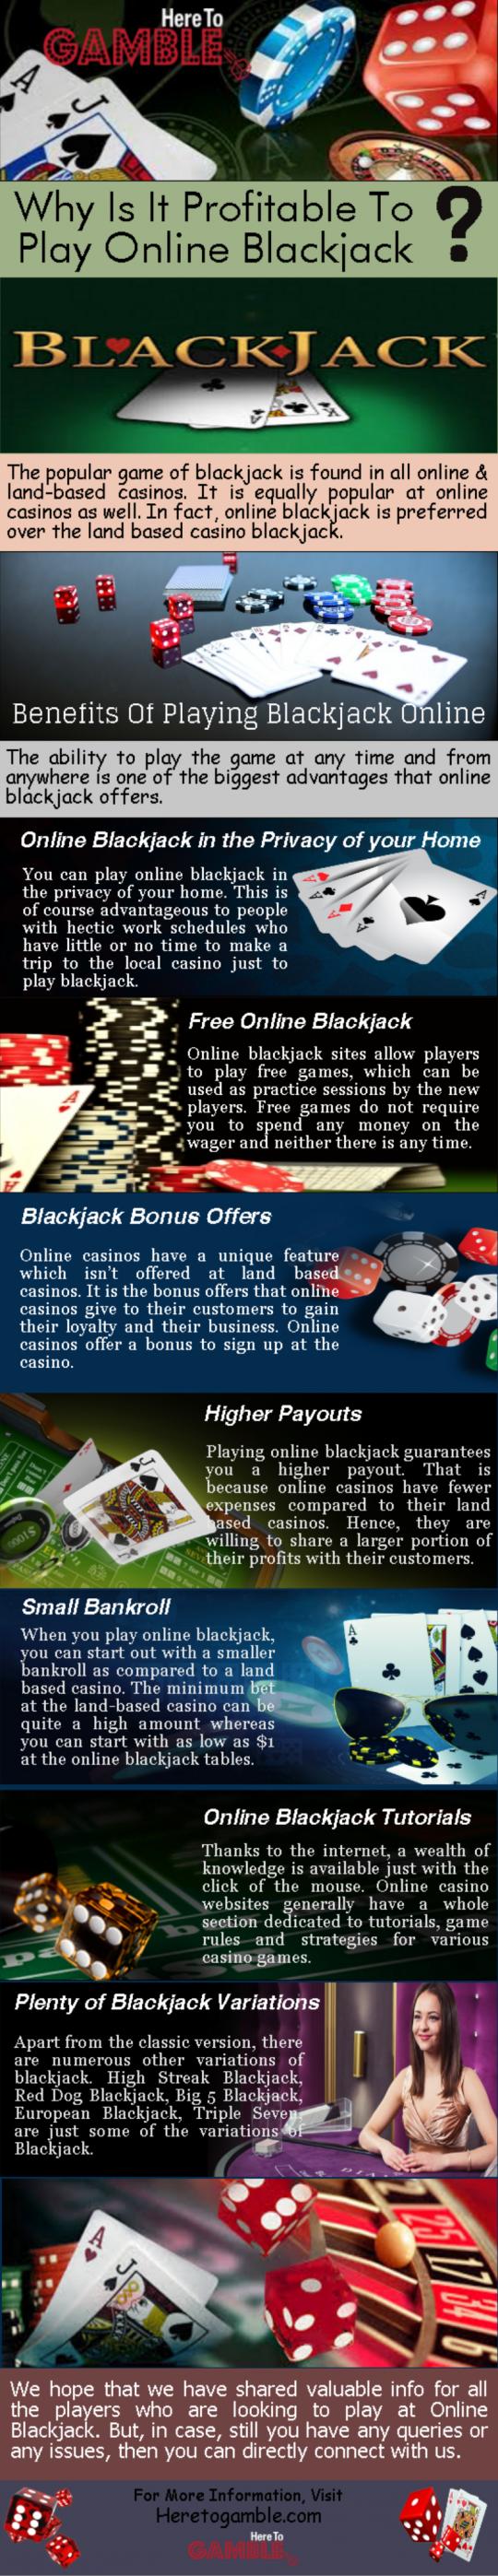 Blackjack taxi